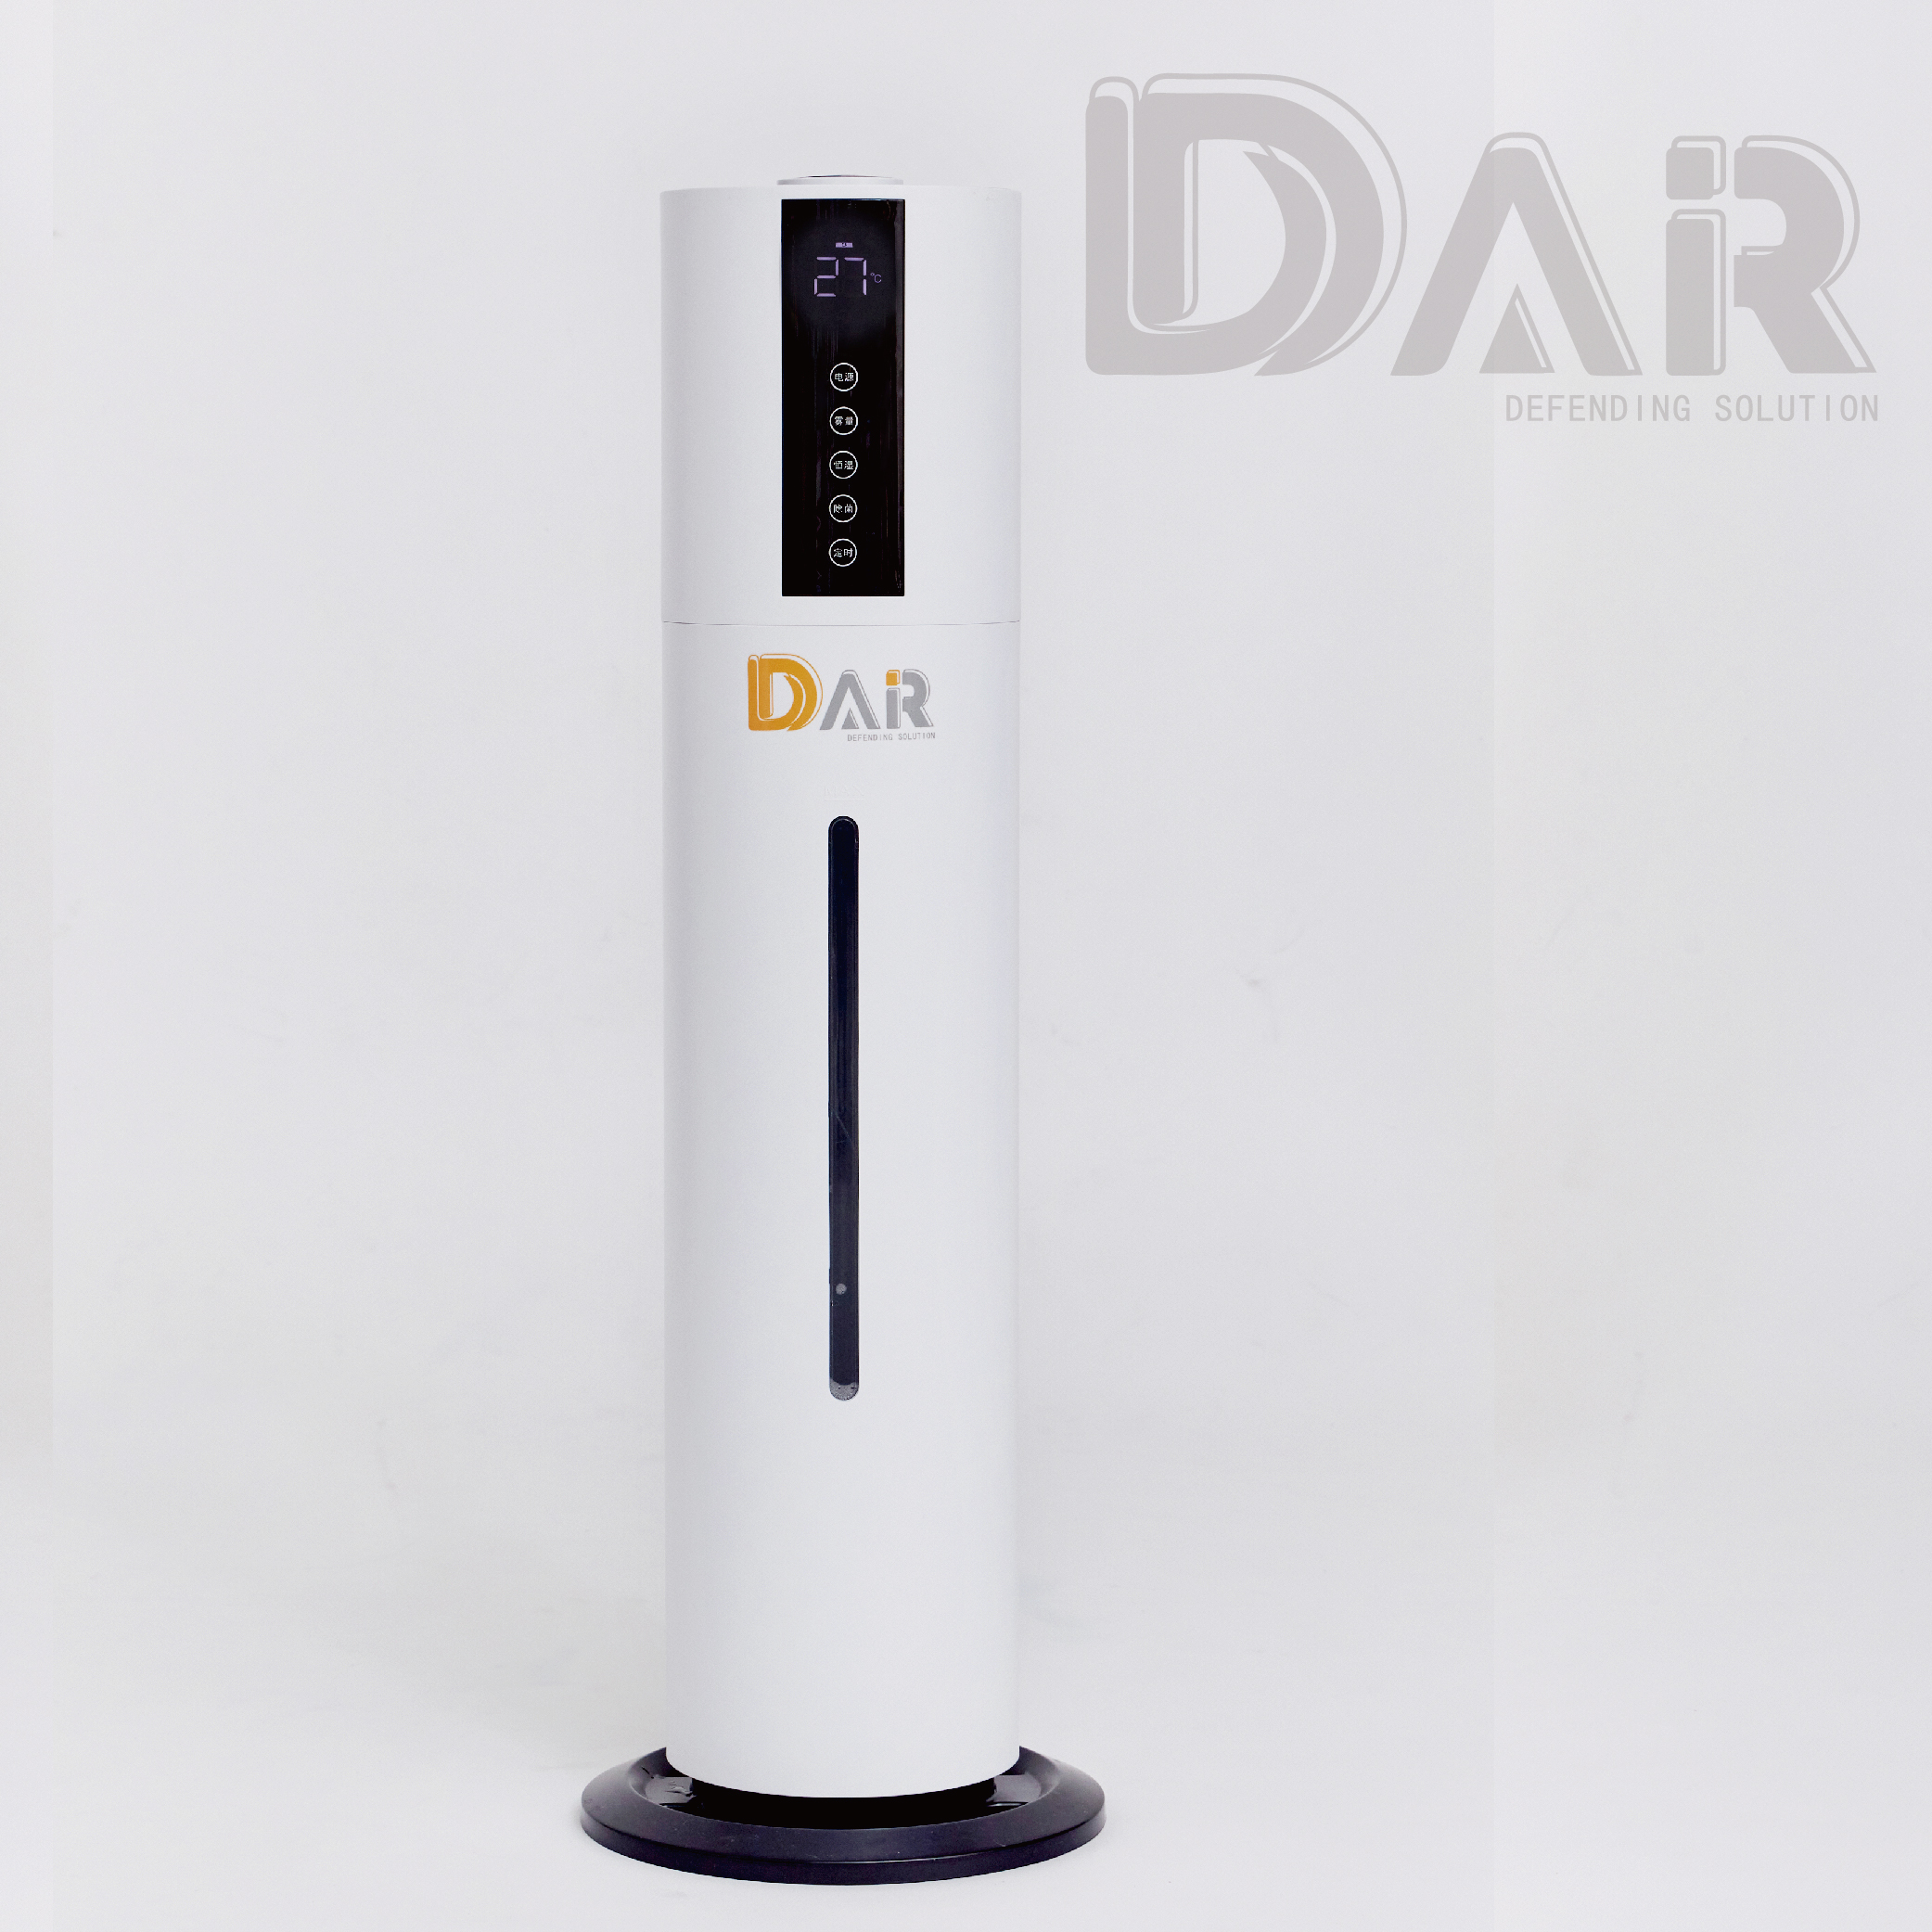 DA5 for WEB